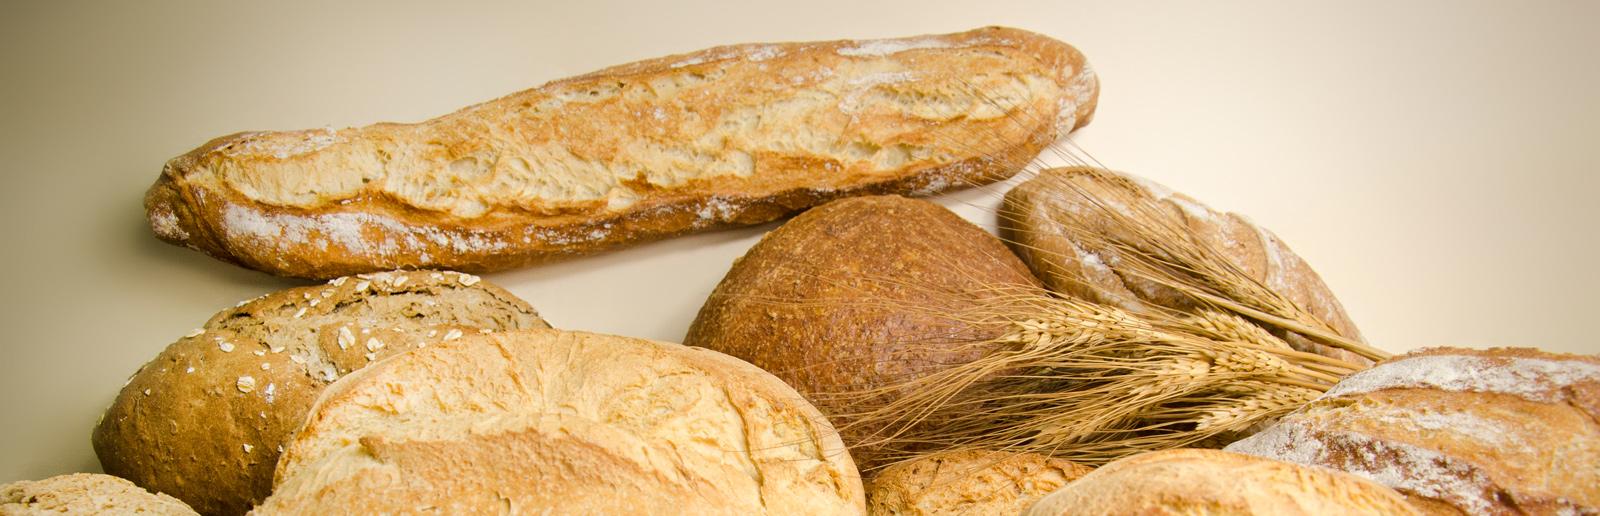 pan-ecologico-panaderia-christian